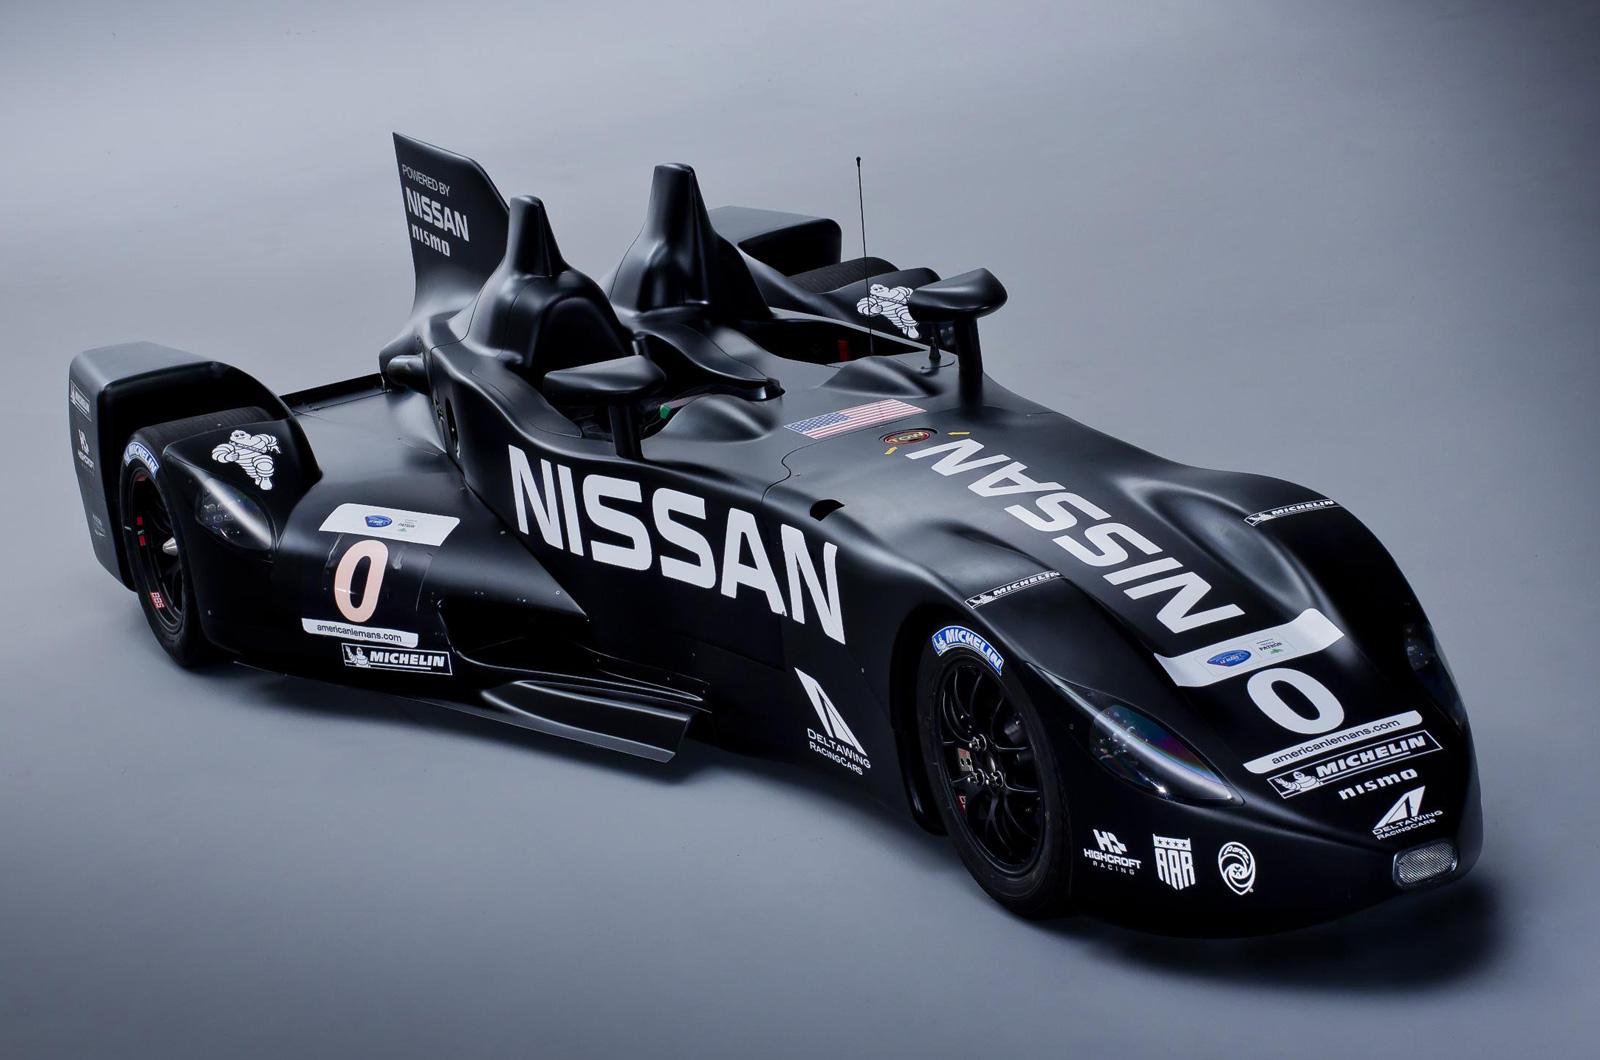 Nissan to make Le Mans comeback